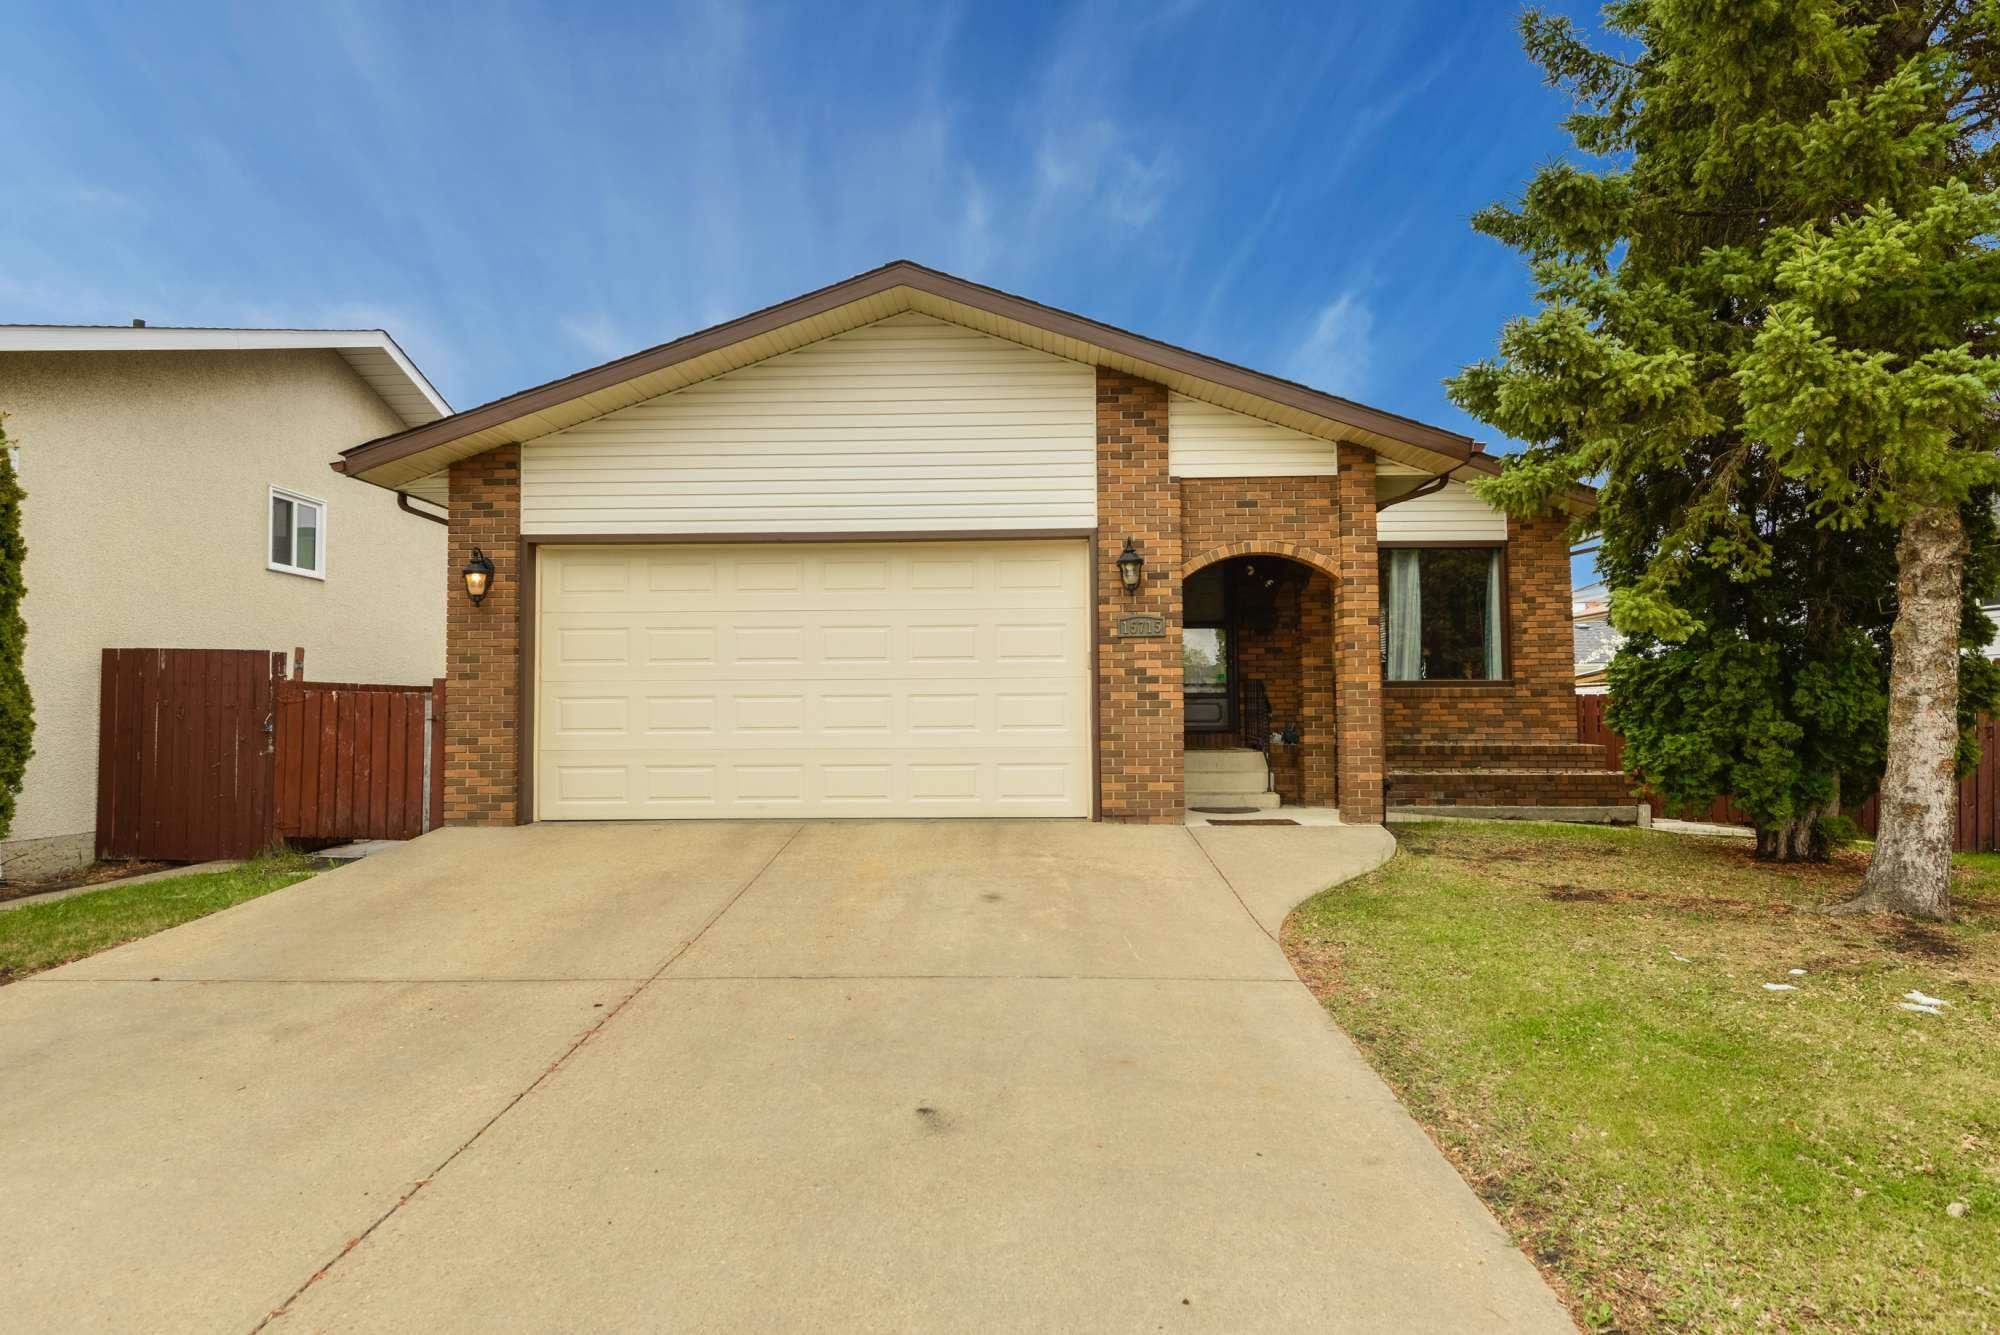 Main Photo: 15715 100 Street in Edmonton: Zone 27 House for sale : MLS®# E4245133